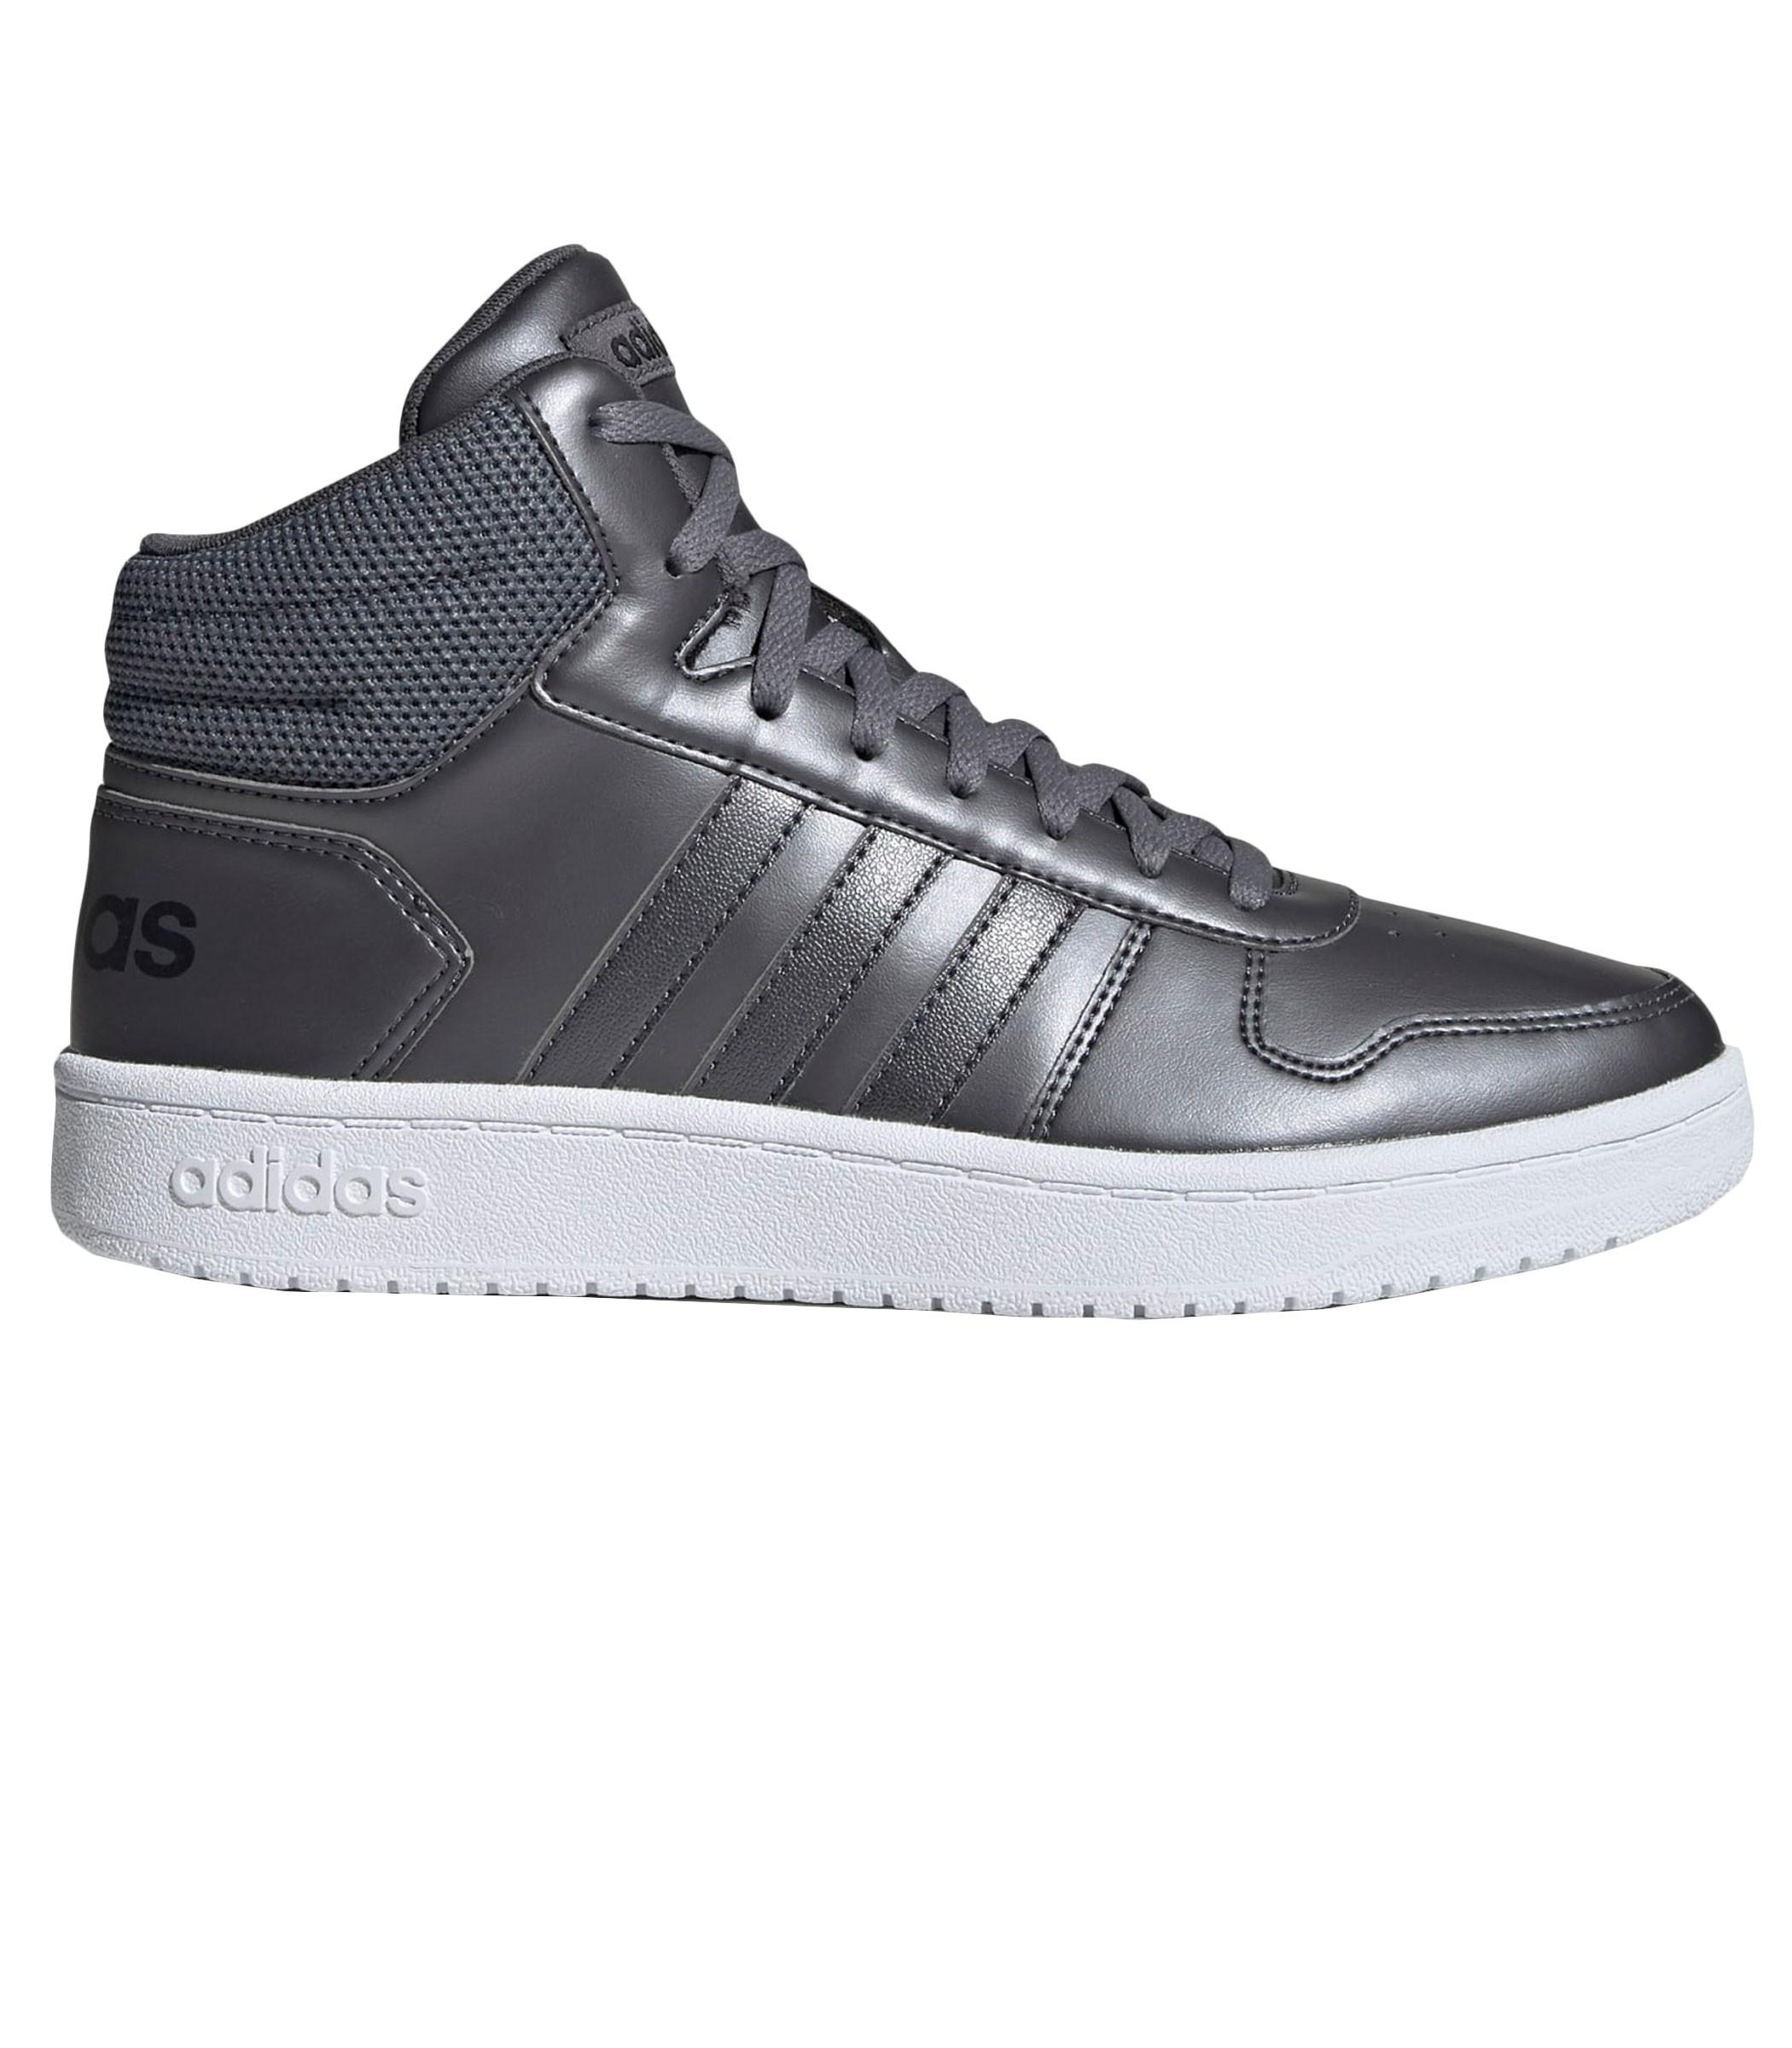 Scarpe Sneakers Adidas Hoops 2.0 Mid colore grigio da donna ...